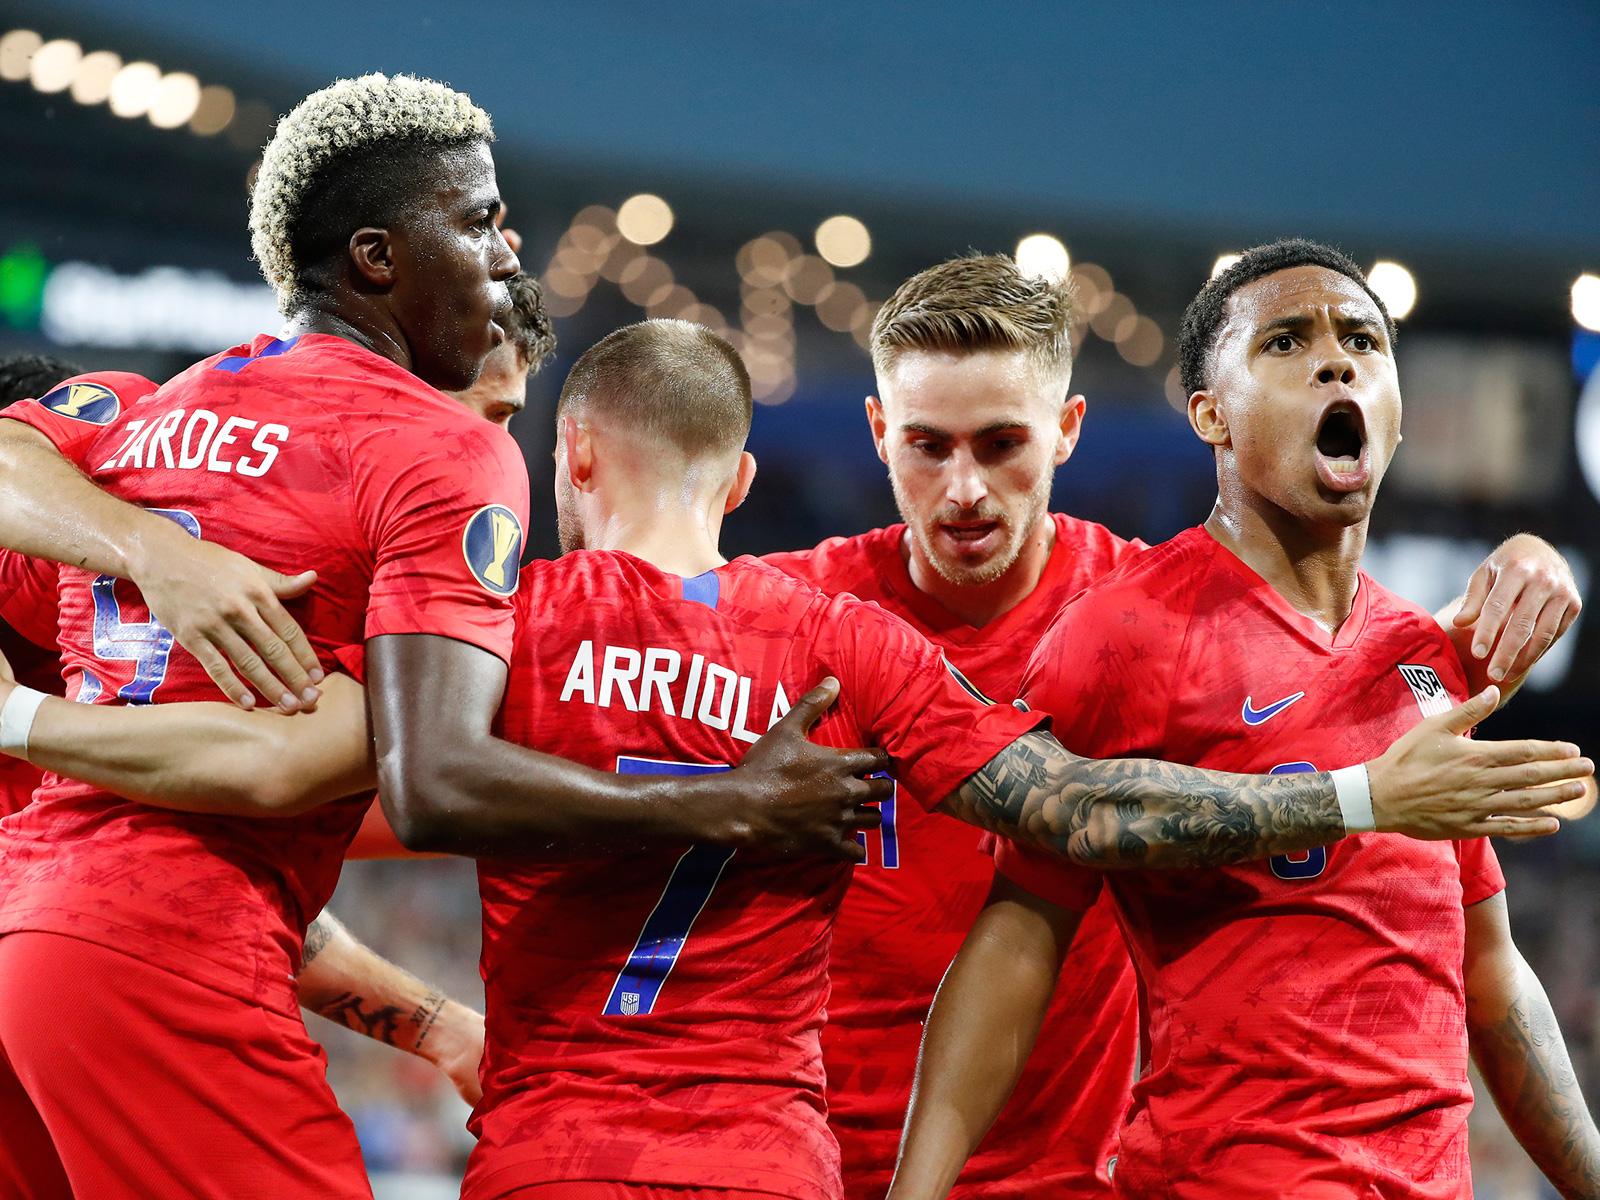 The USA faces Trinidad & Tobago in the Concacaf Gold Cup